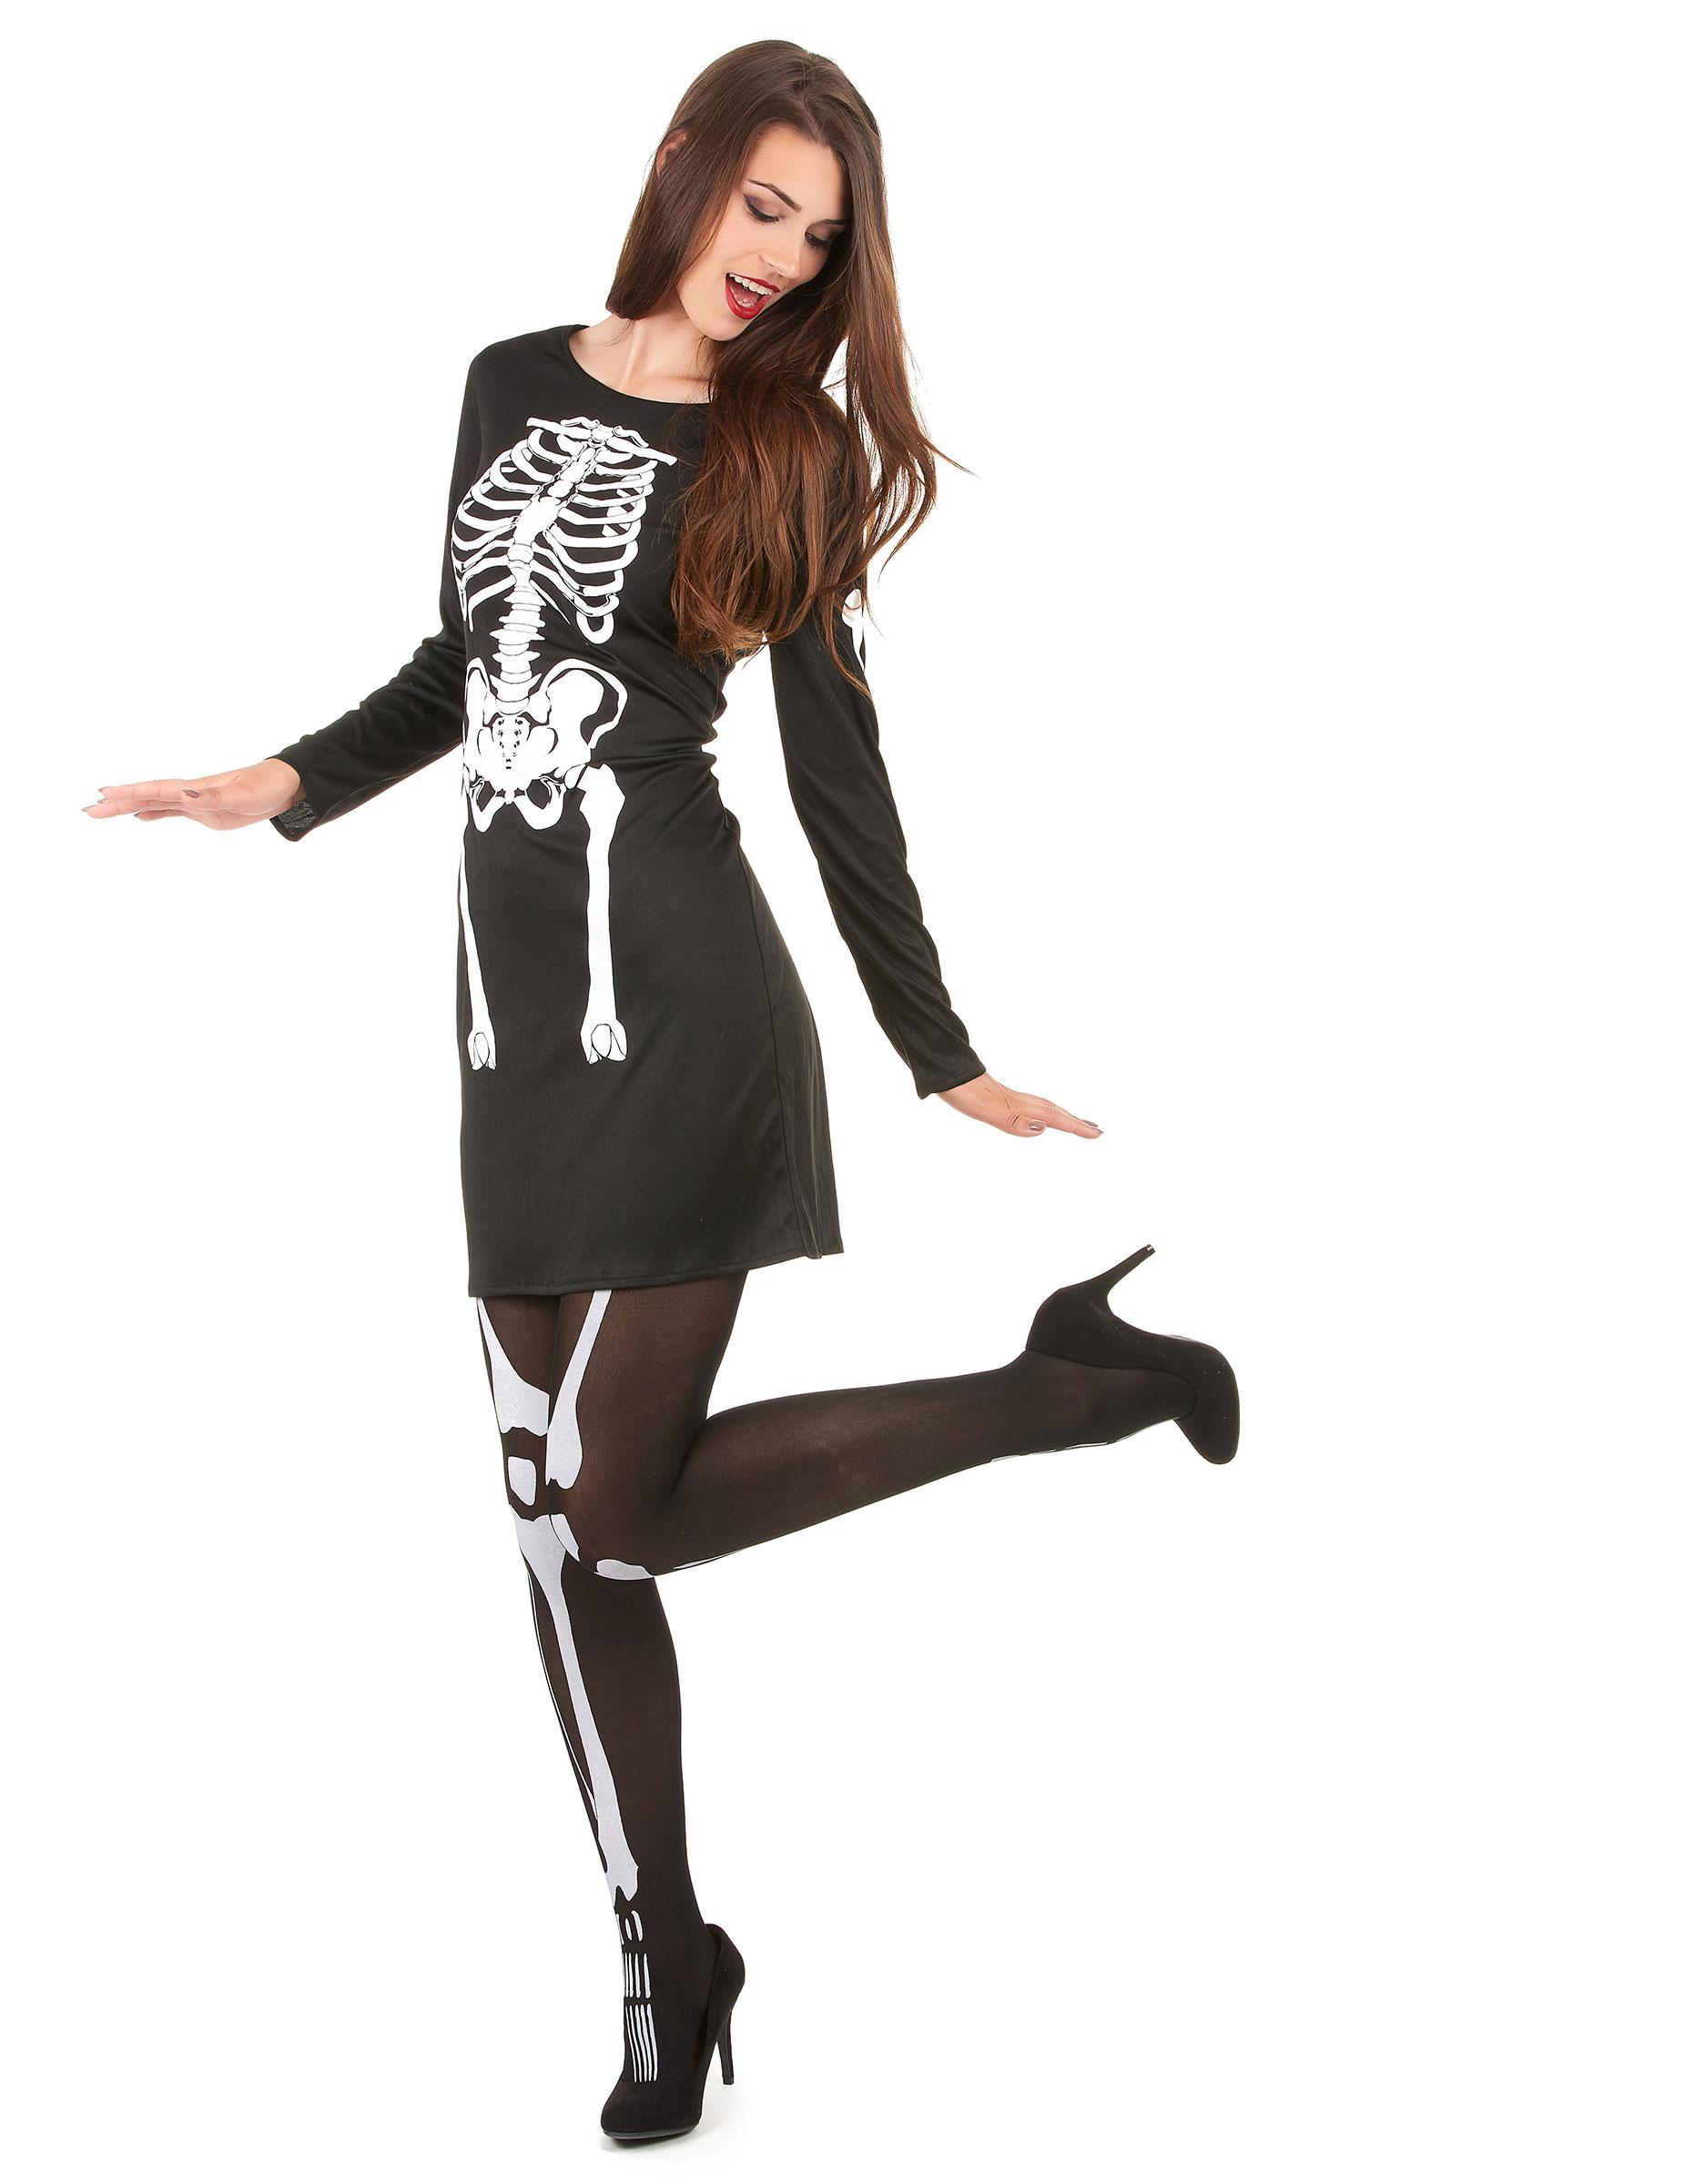 Costume scheletro Halloween donna  Costumi adulti e2cff385d6f0